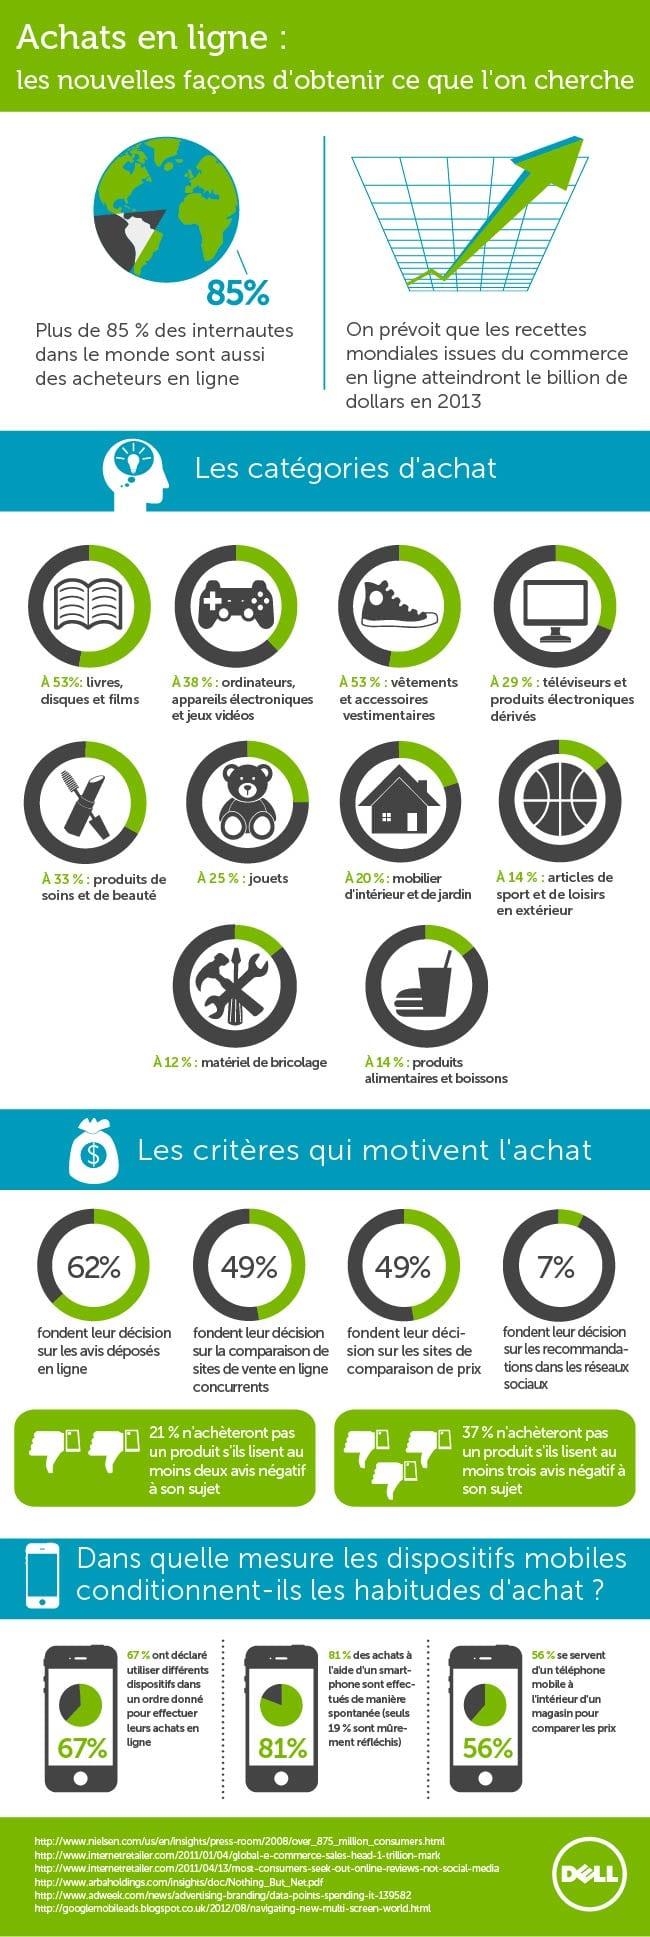 infographie achats en ligne france